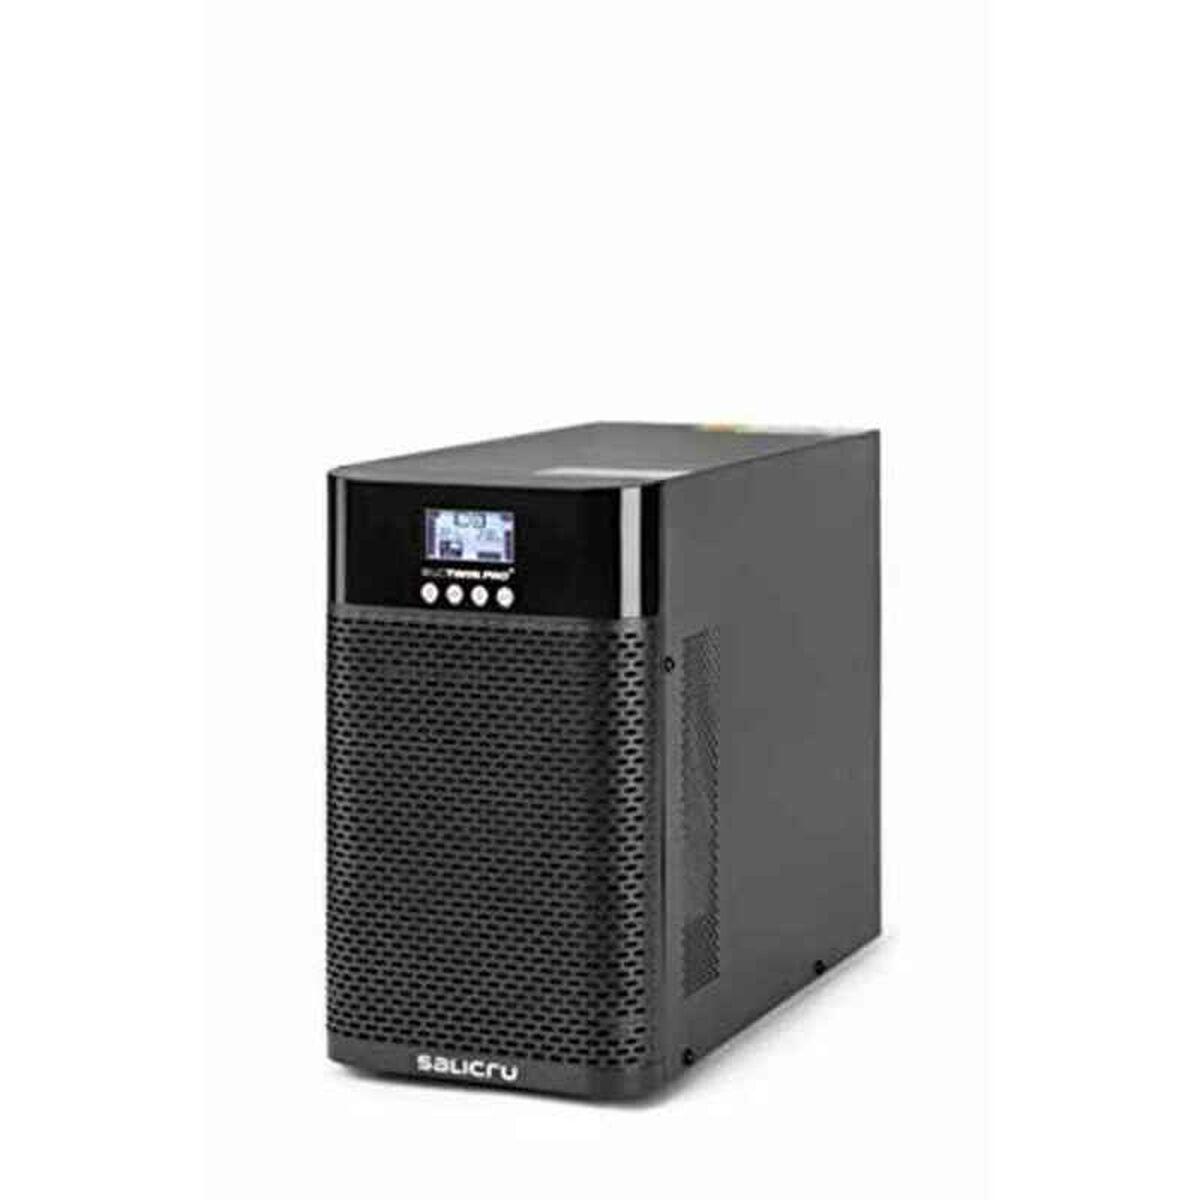 Interactive UPS Salicru SLC-2000-TWIN PRO2 2000W